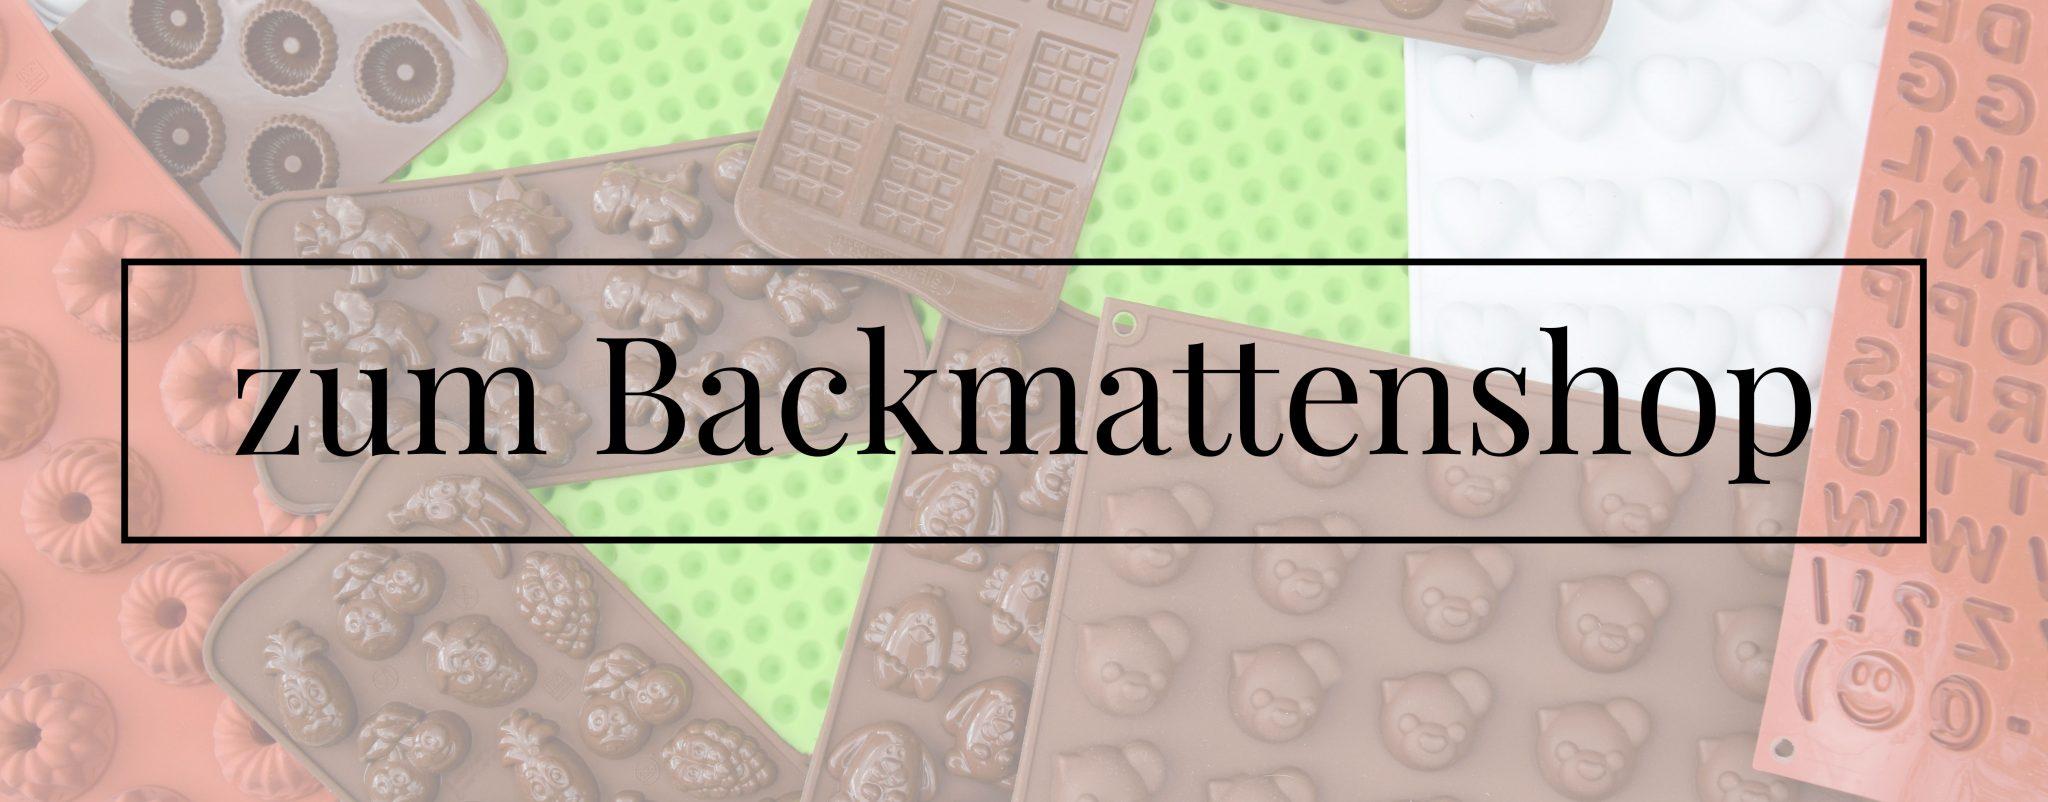 Backmattenshop.de